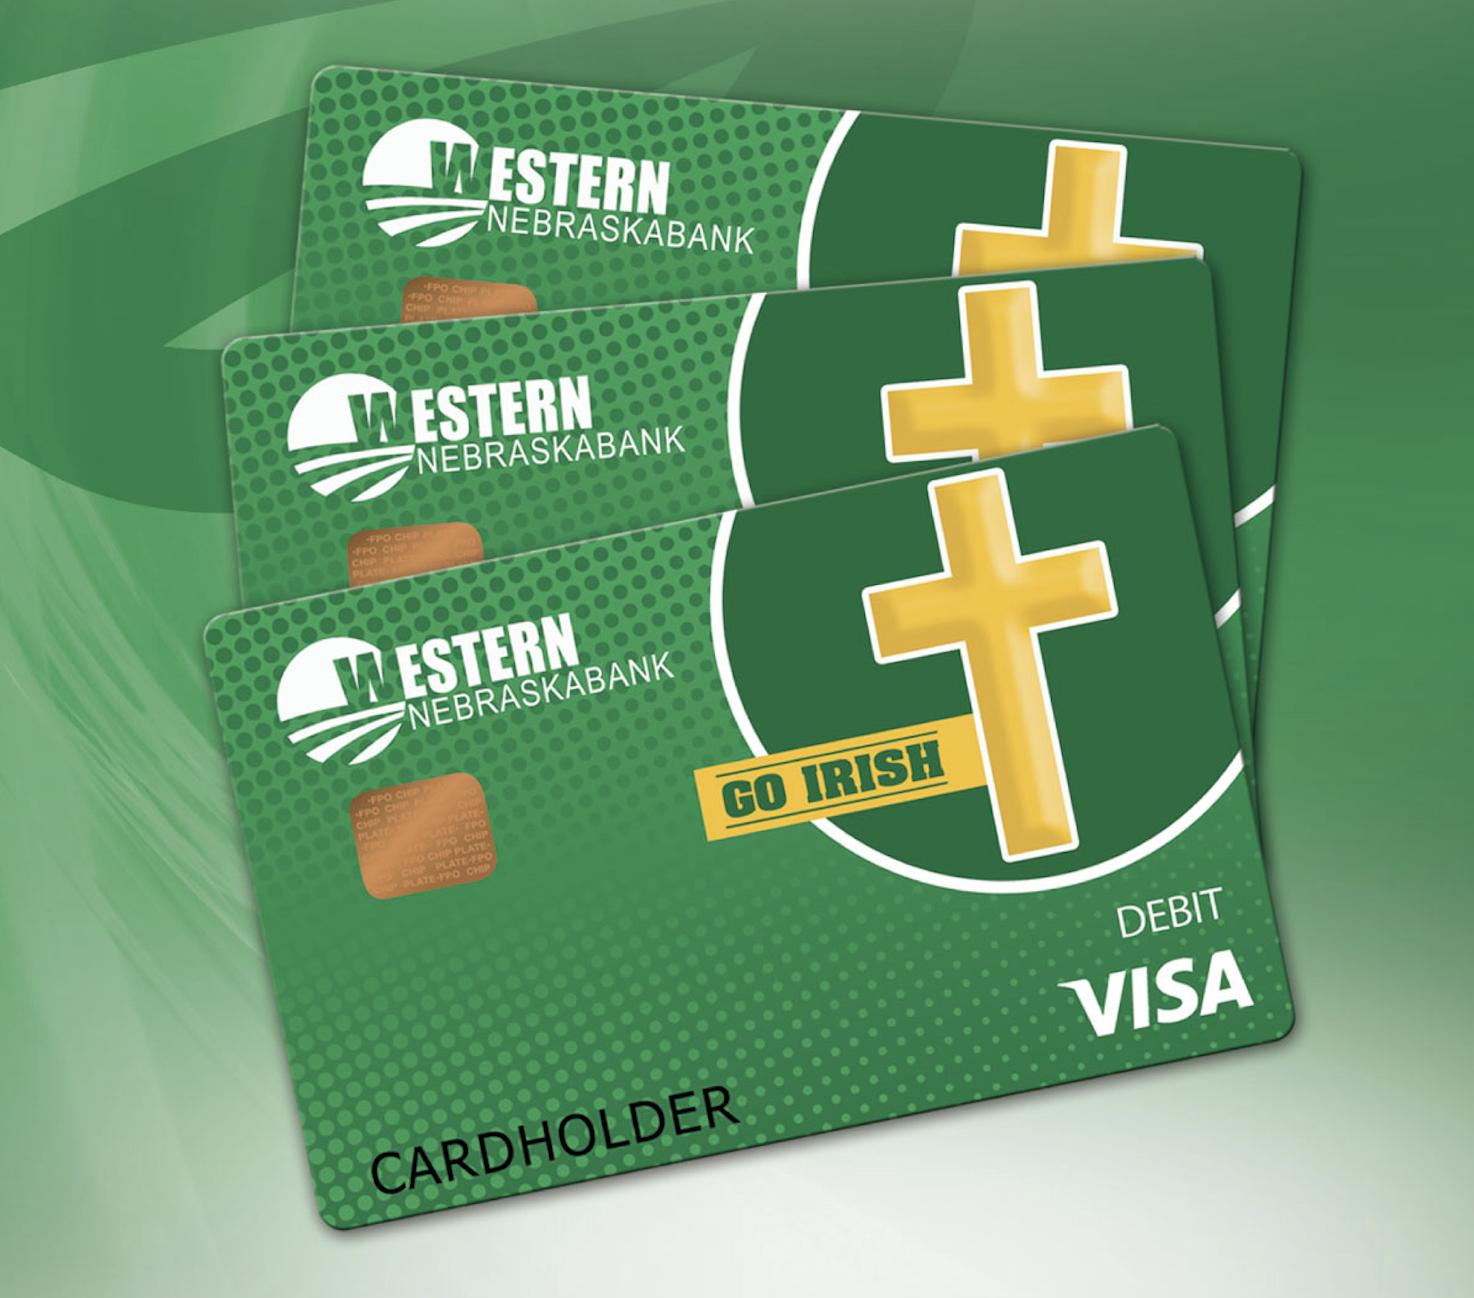 WNB Debit cards